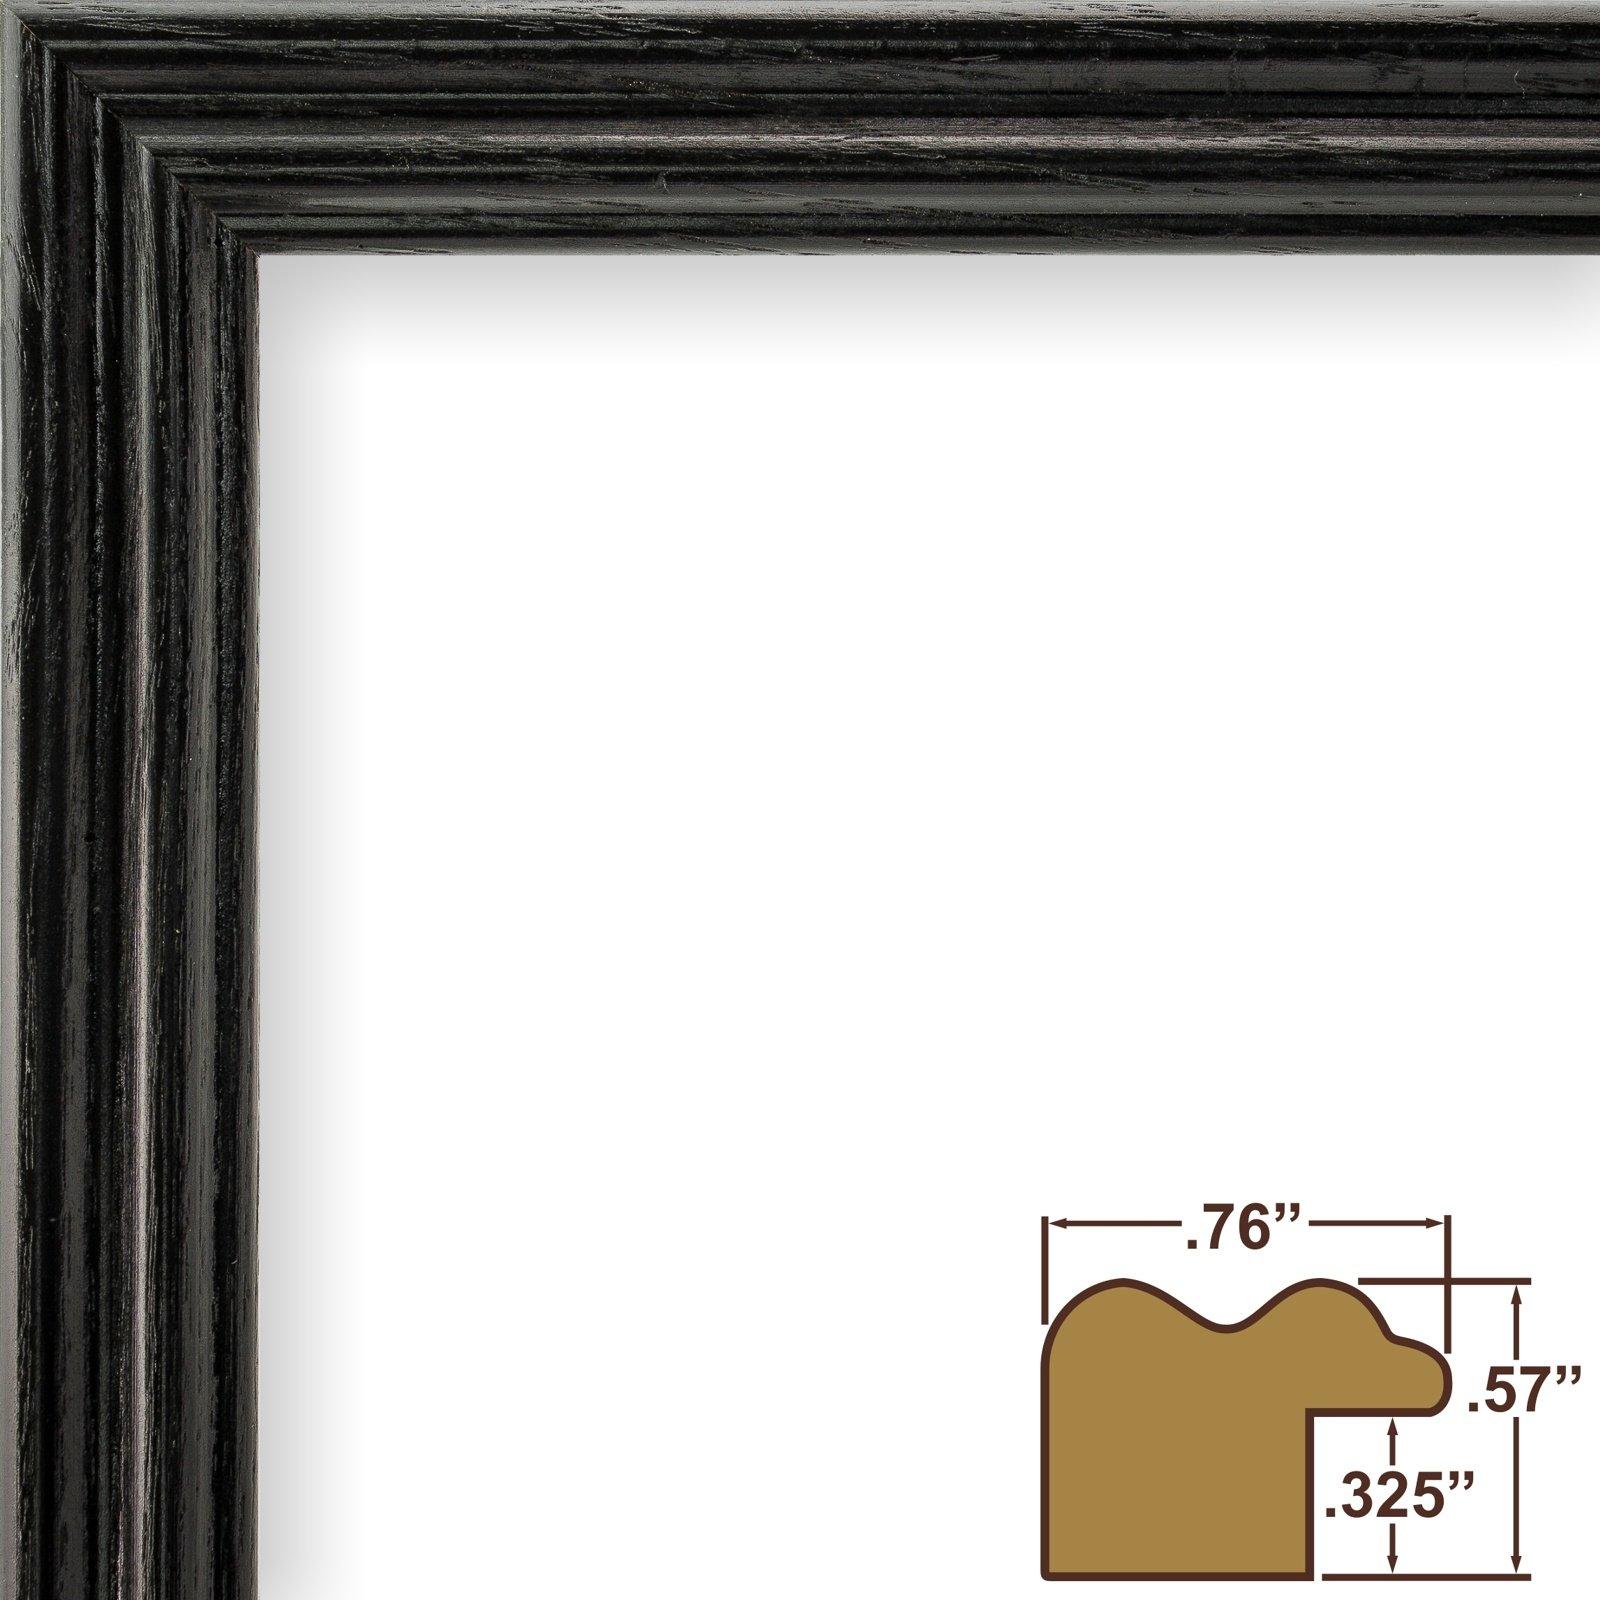 Craig Frames 200ASHBK 16 by 20-Inch Picture Frame, Wood Grain Finish, .75-Inch Wide, Black by Craig Frames